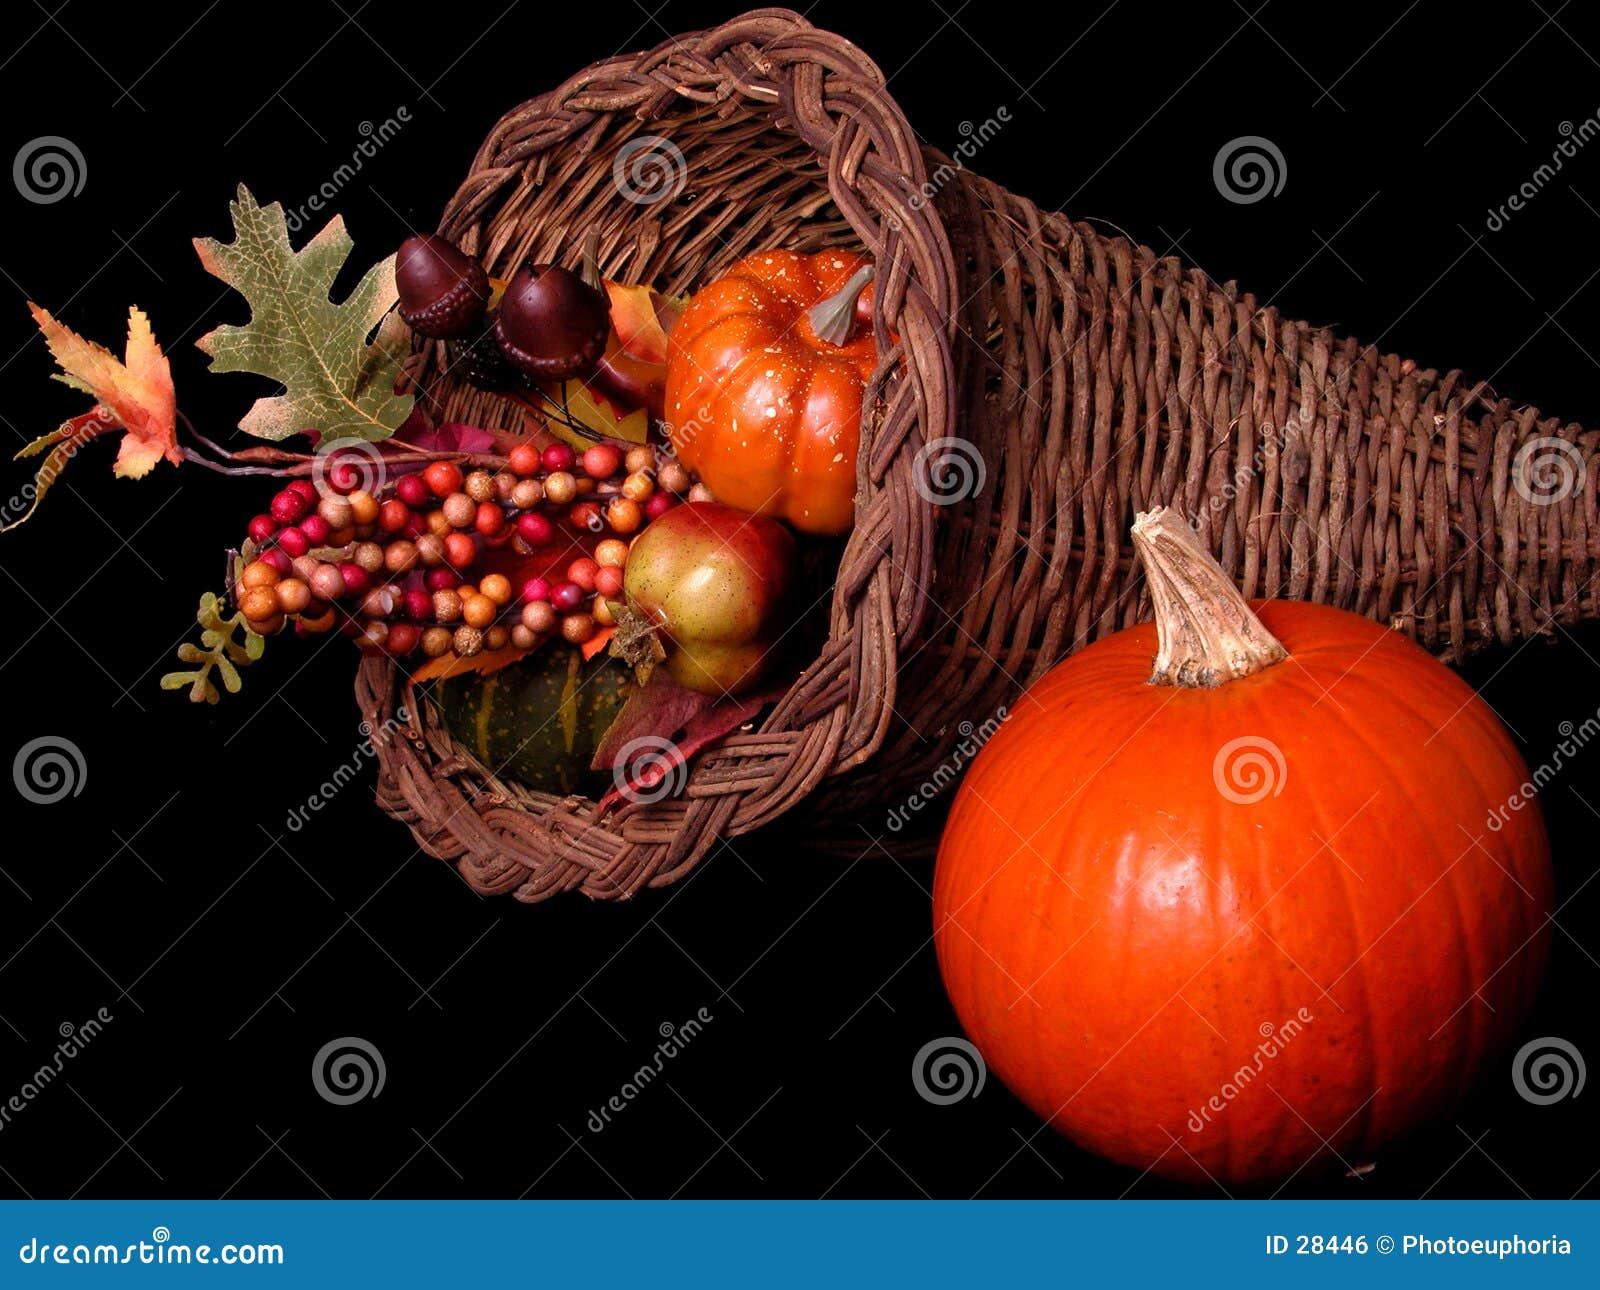 Pumpkin & Horn Basket Arrangement on Black